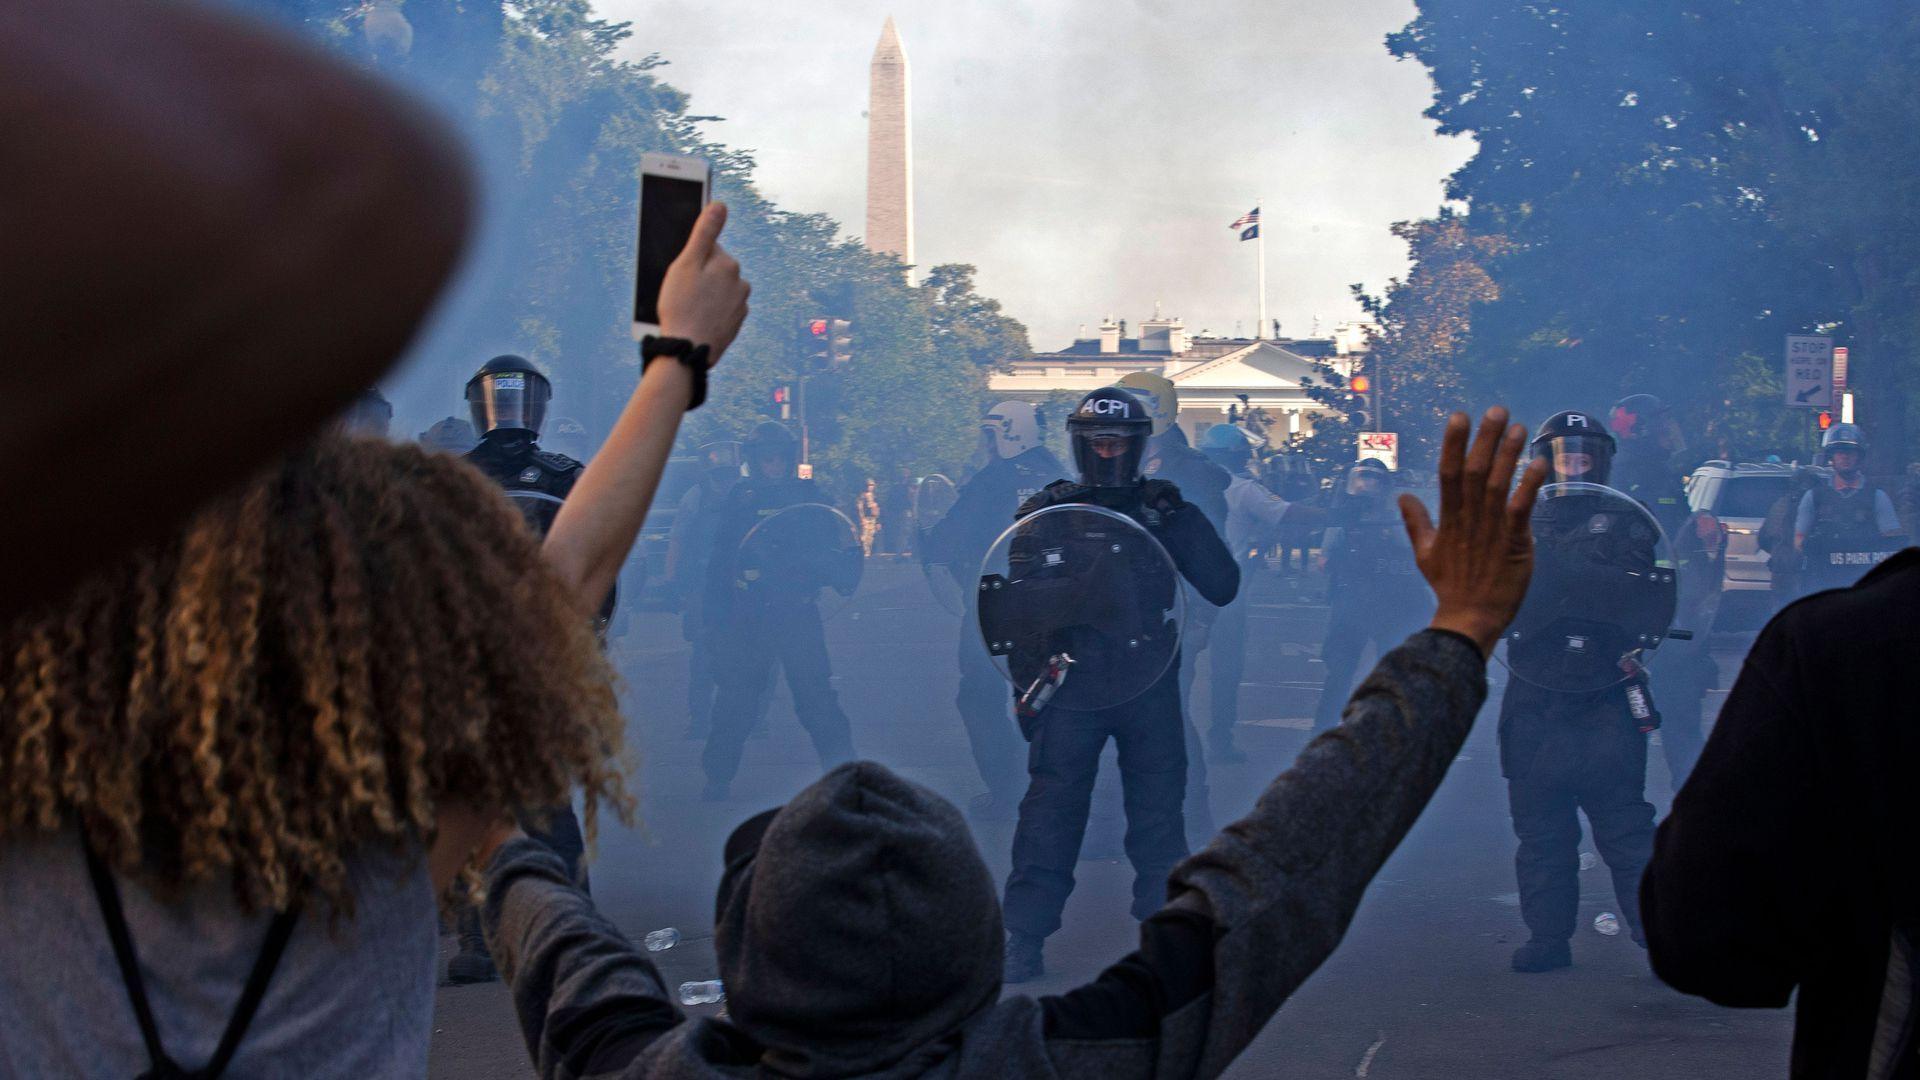 Updates: George Floyd protests nationwide